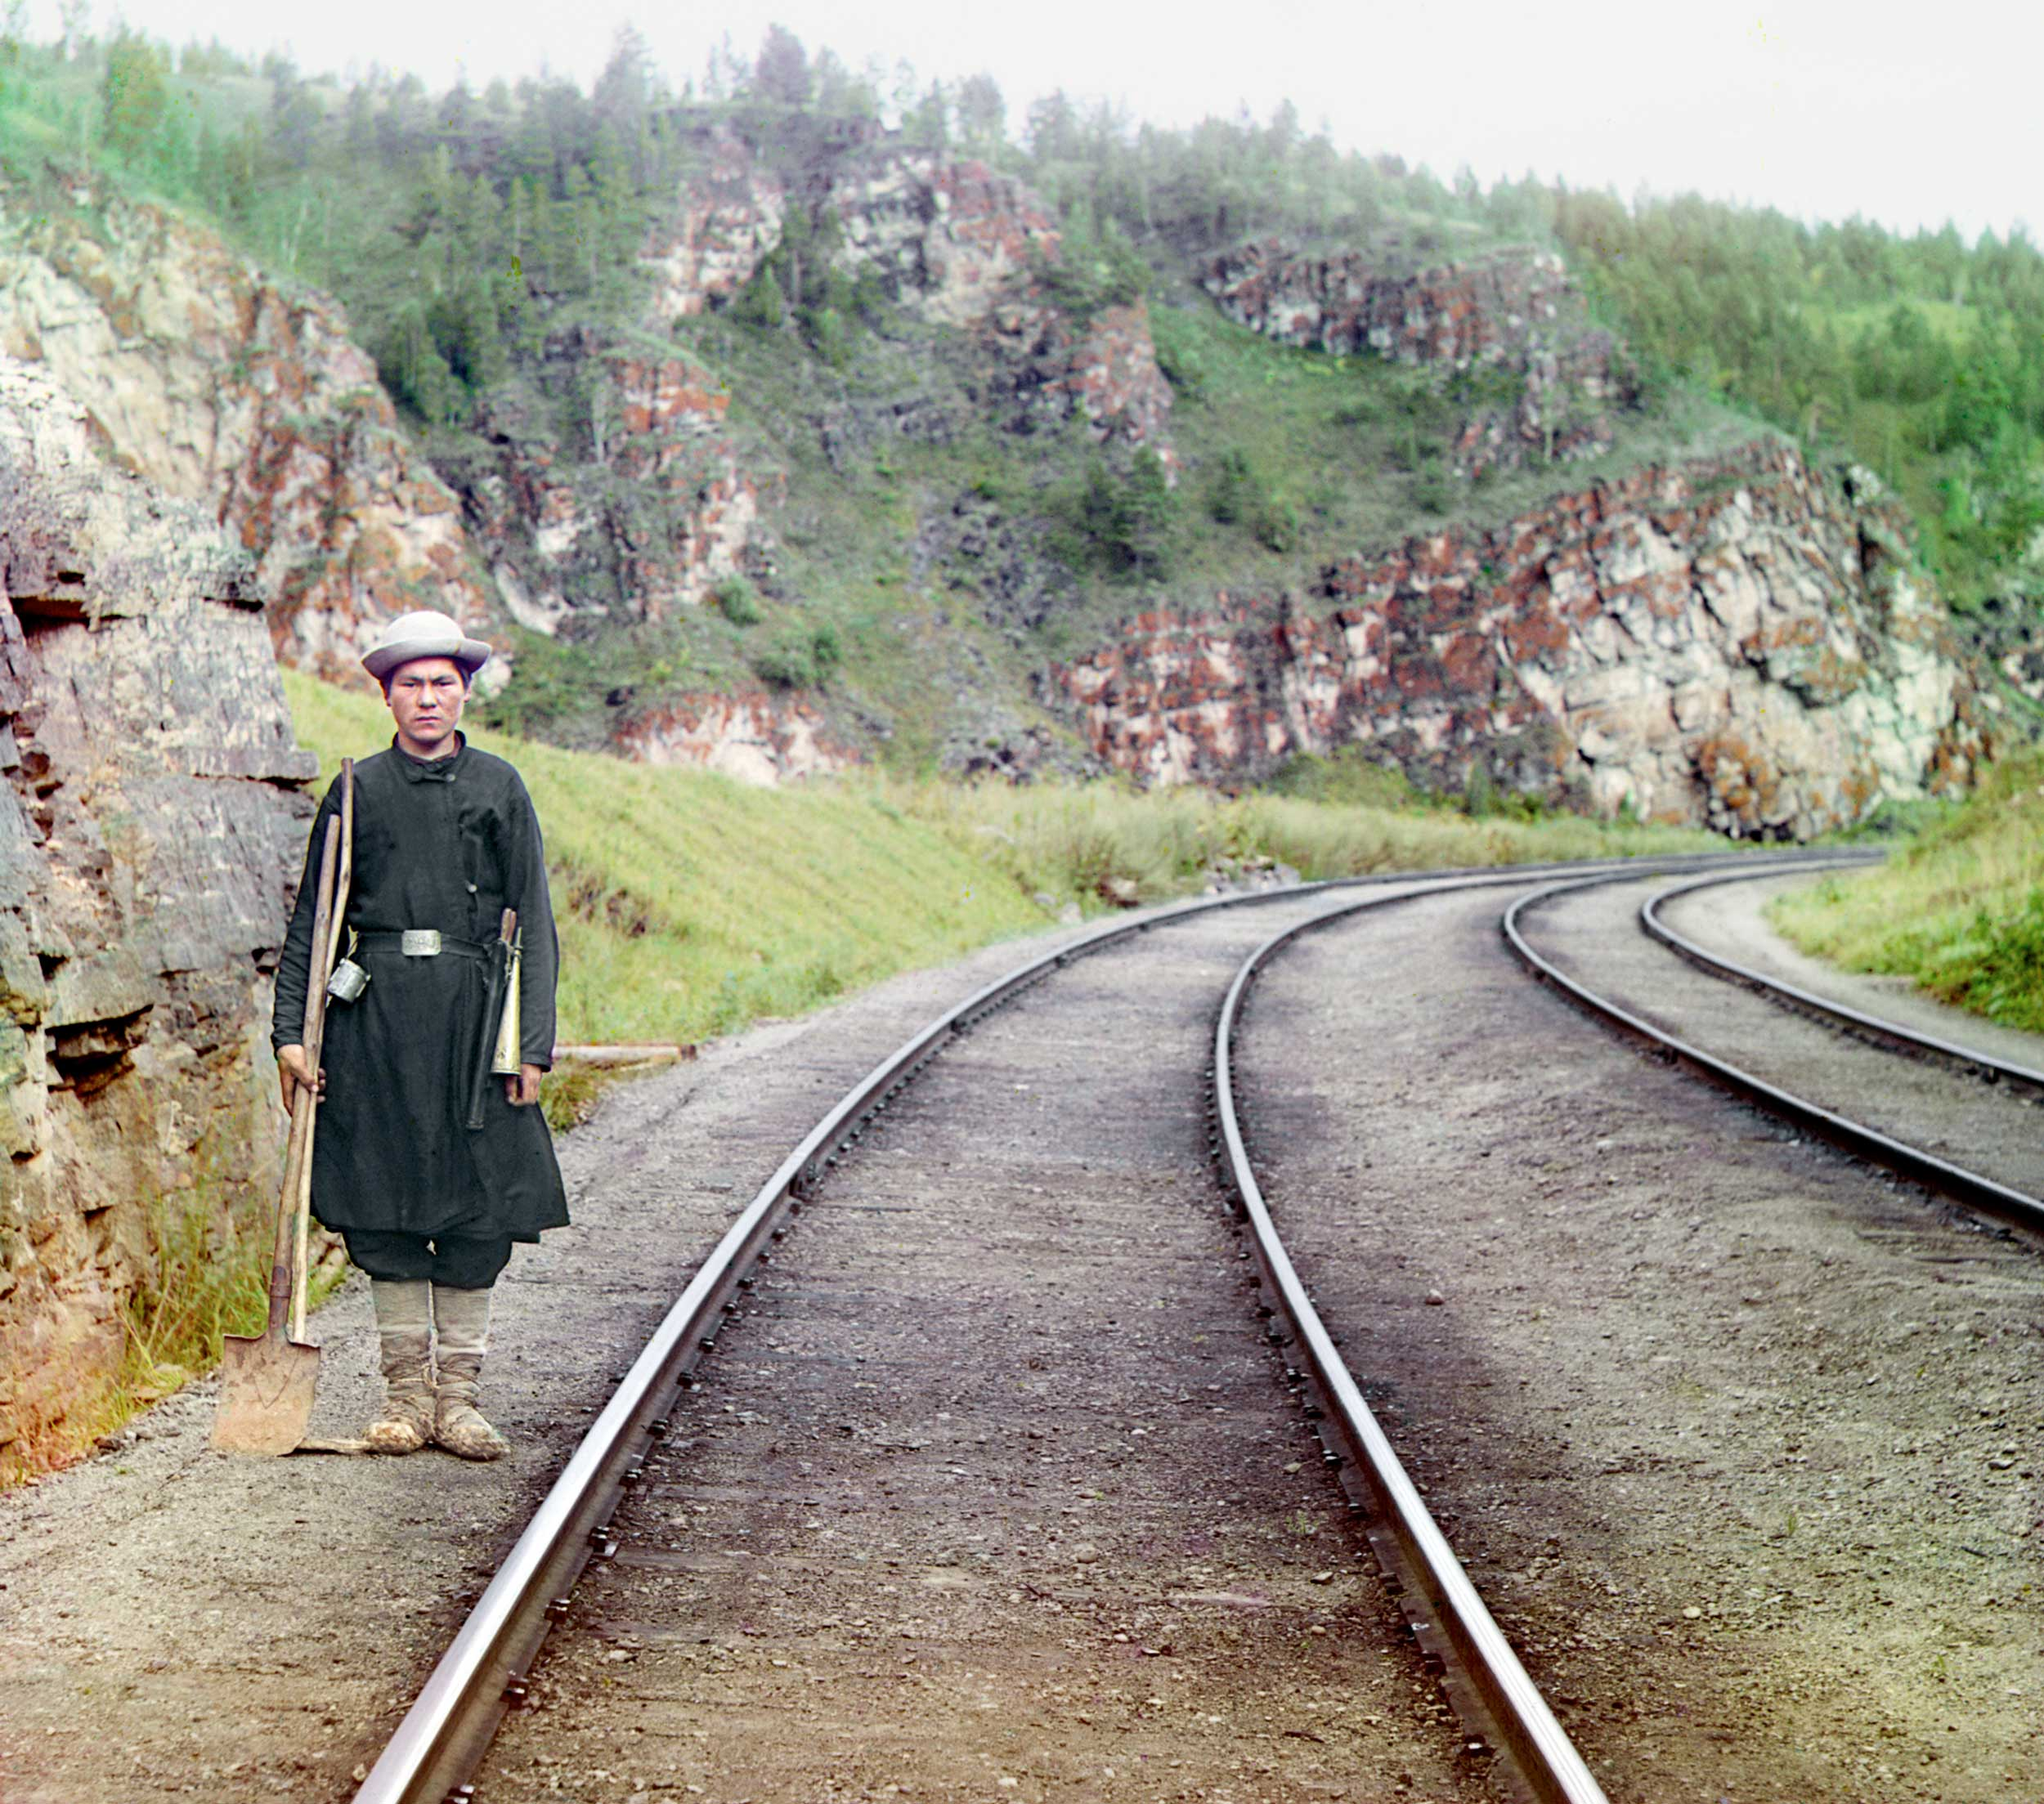 1910 -  Bashkir switch operator